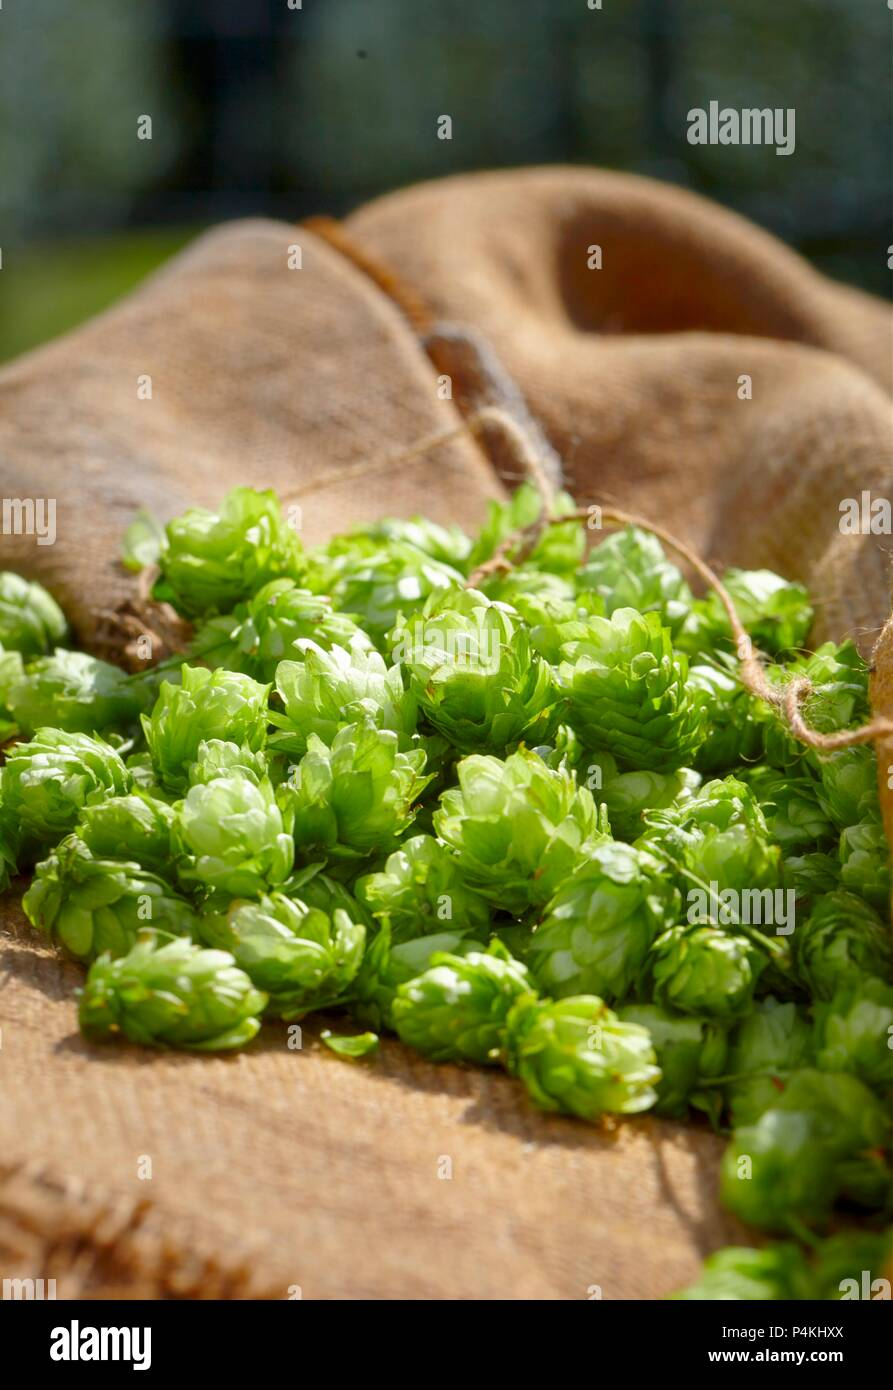 Fresh hops on a jute sack - Stock Image